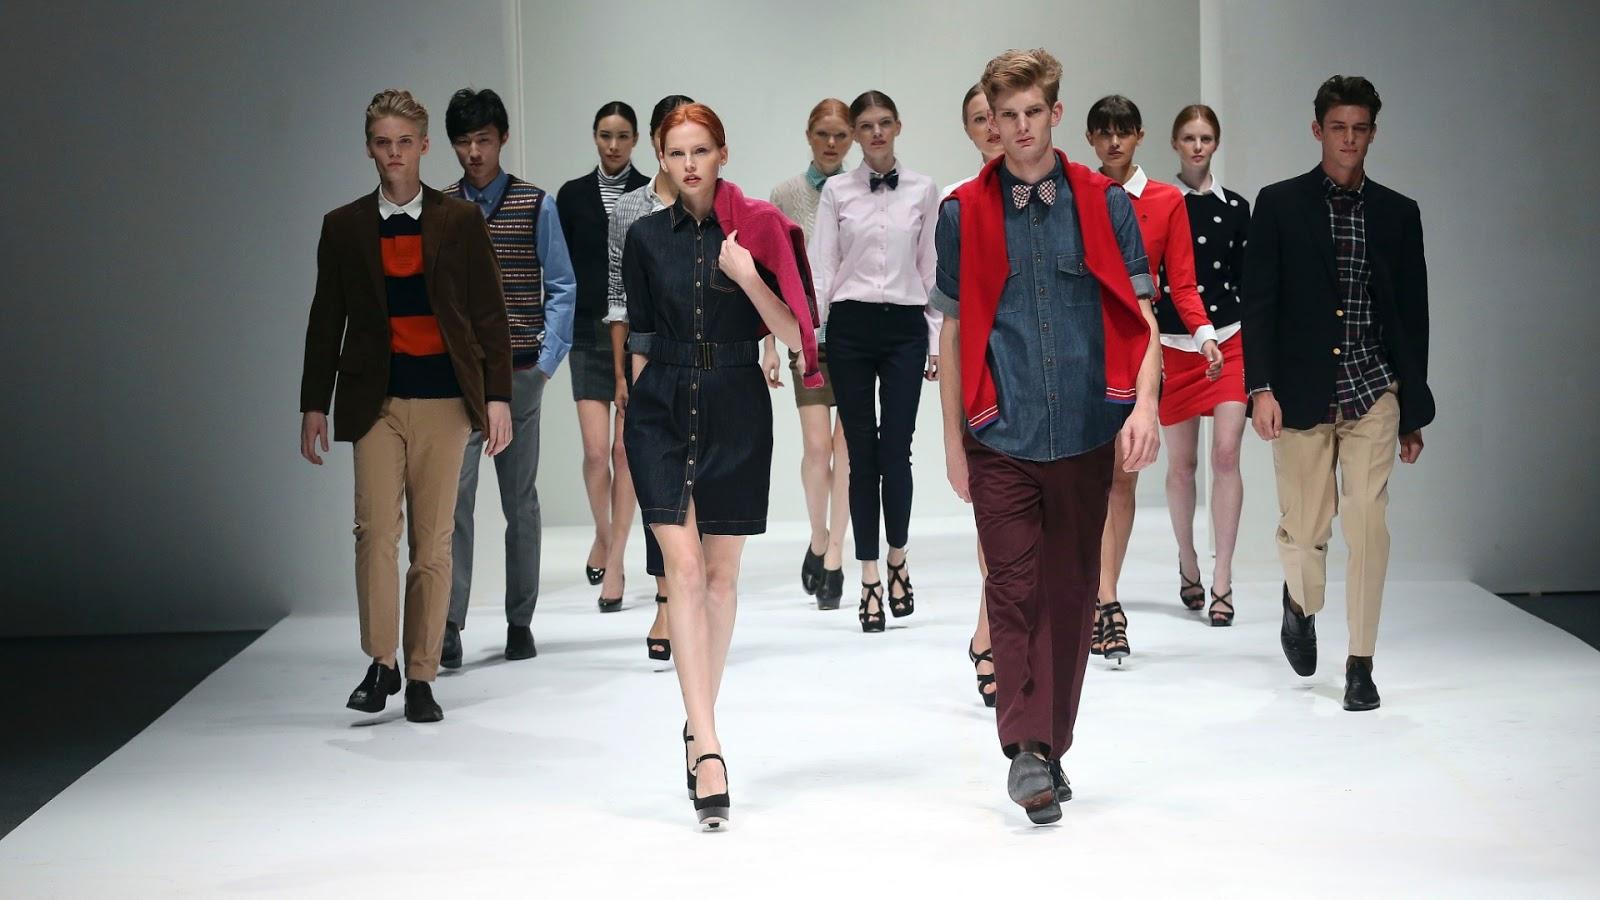 Fashion Desktop Backgrounds - WallpaperSafari